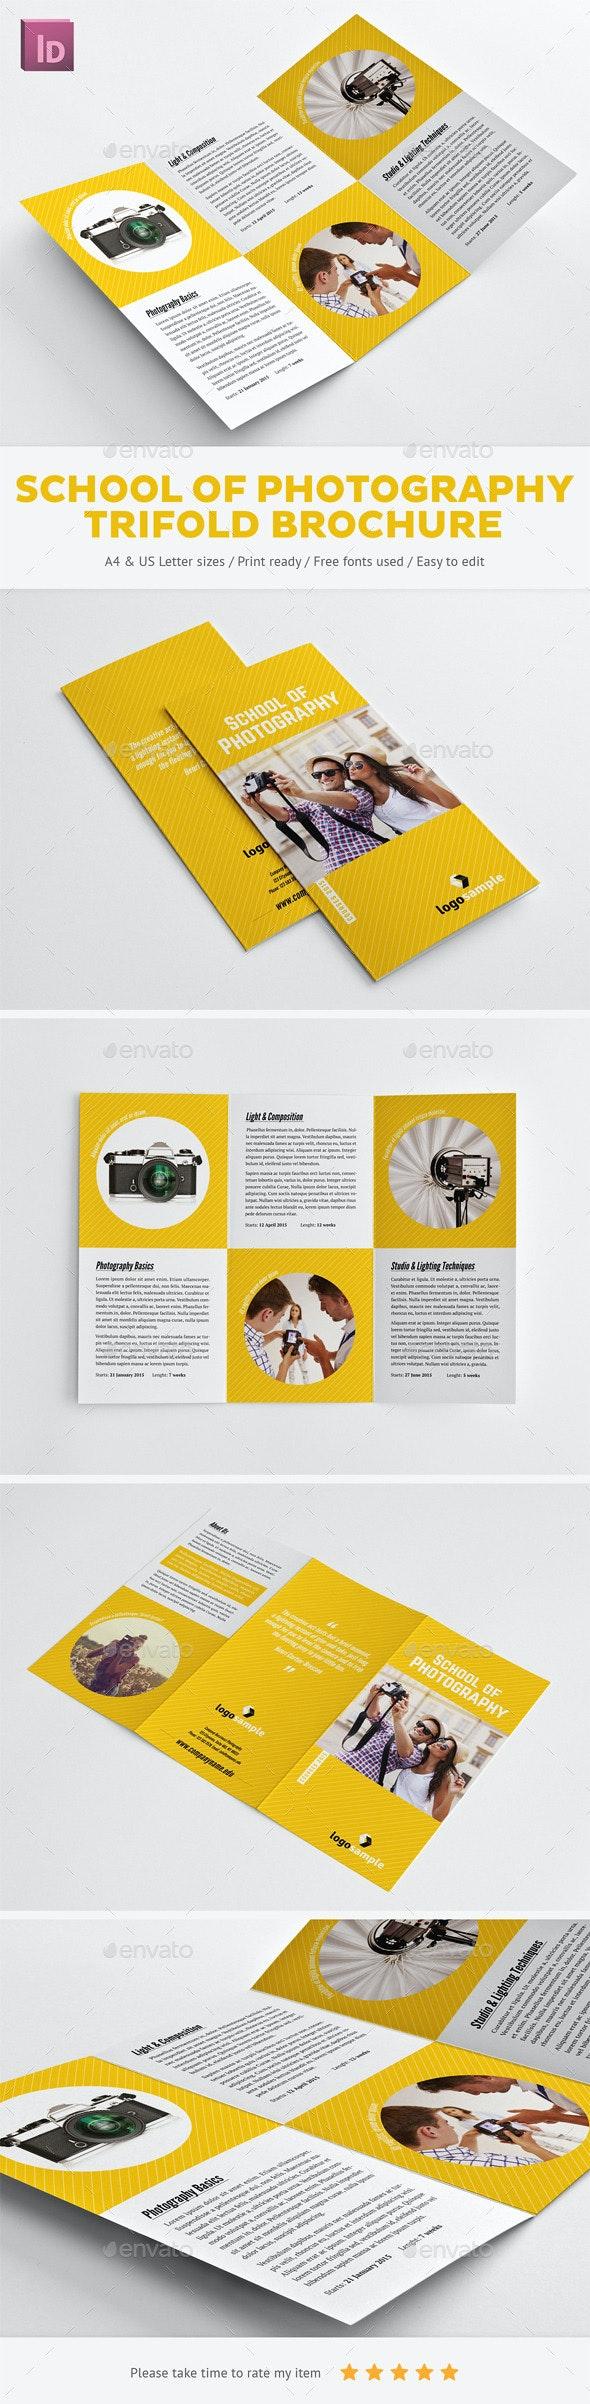 School of Photography Trifold Brochure - Informational Brochures